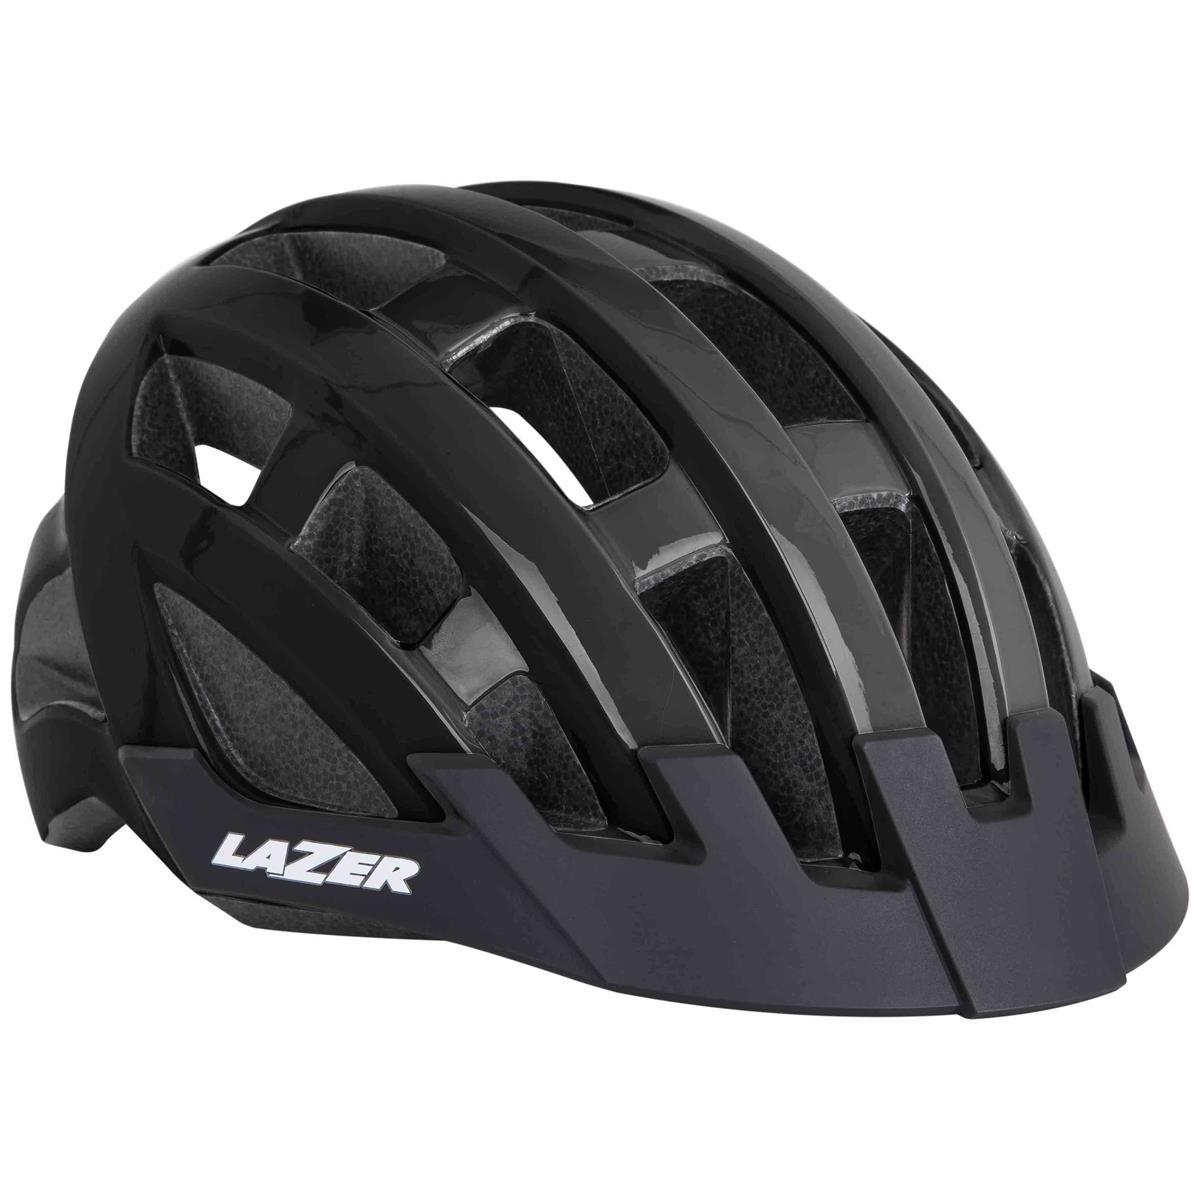 Helmet compact black one size (54-61)